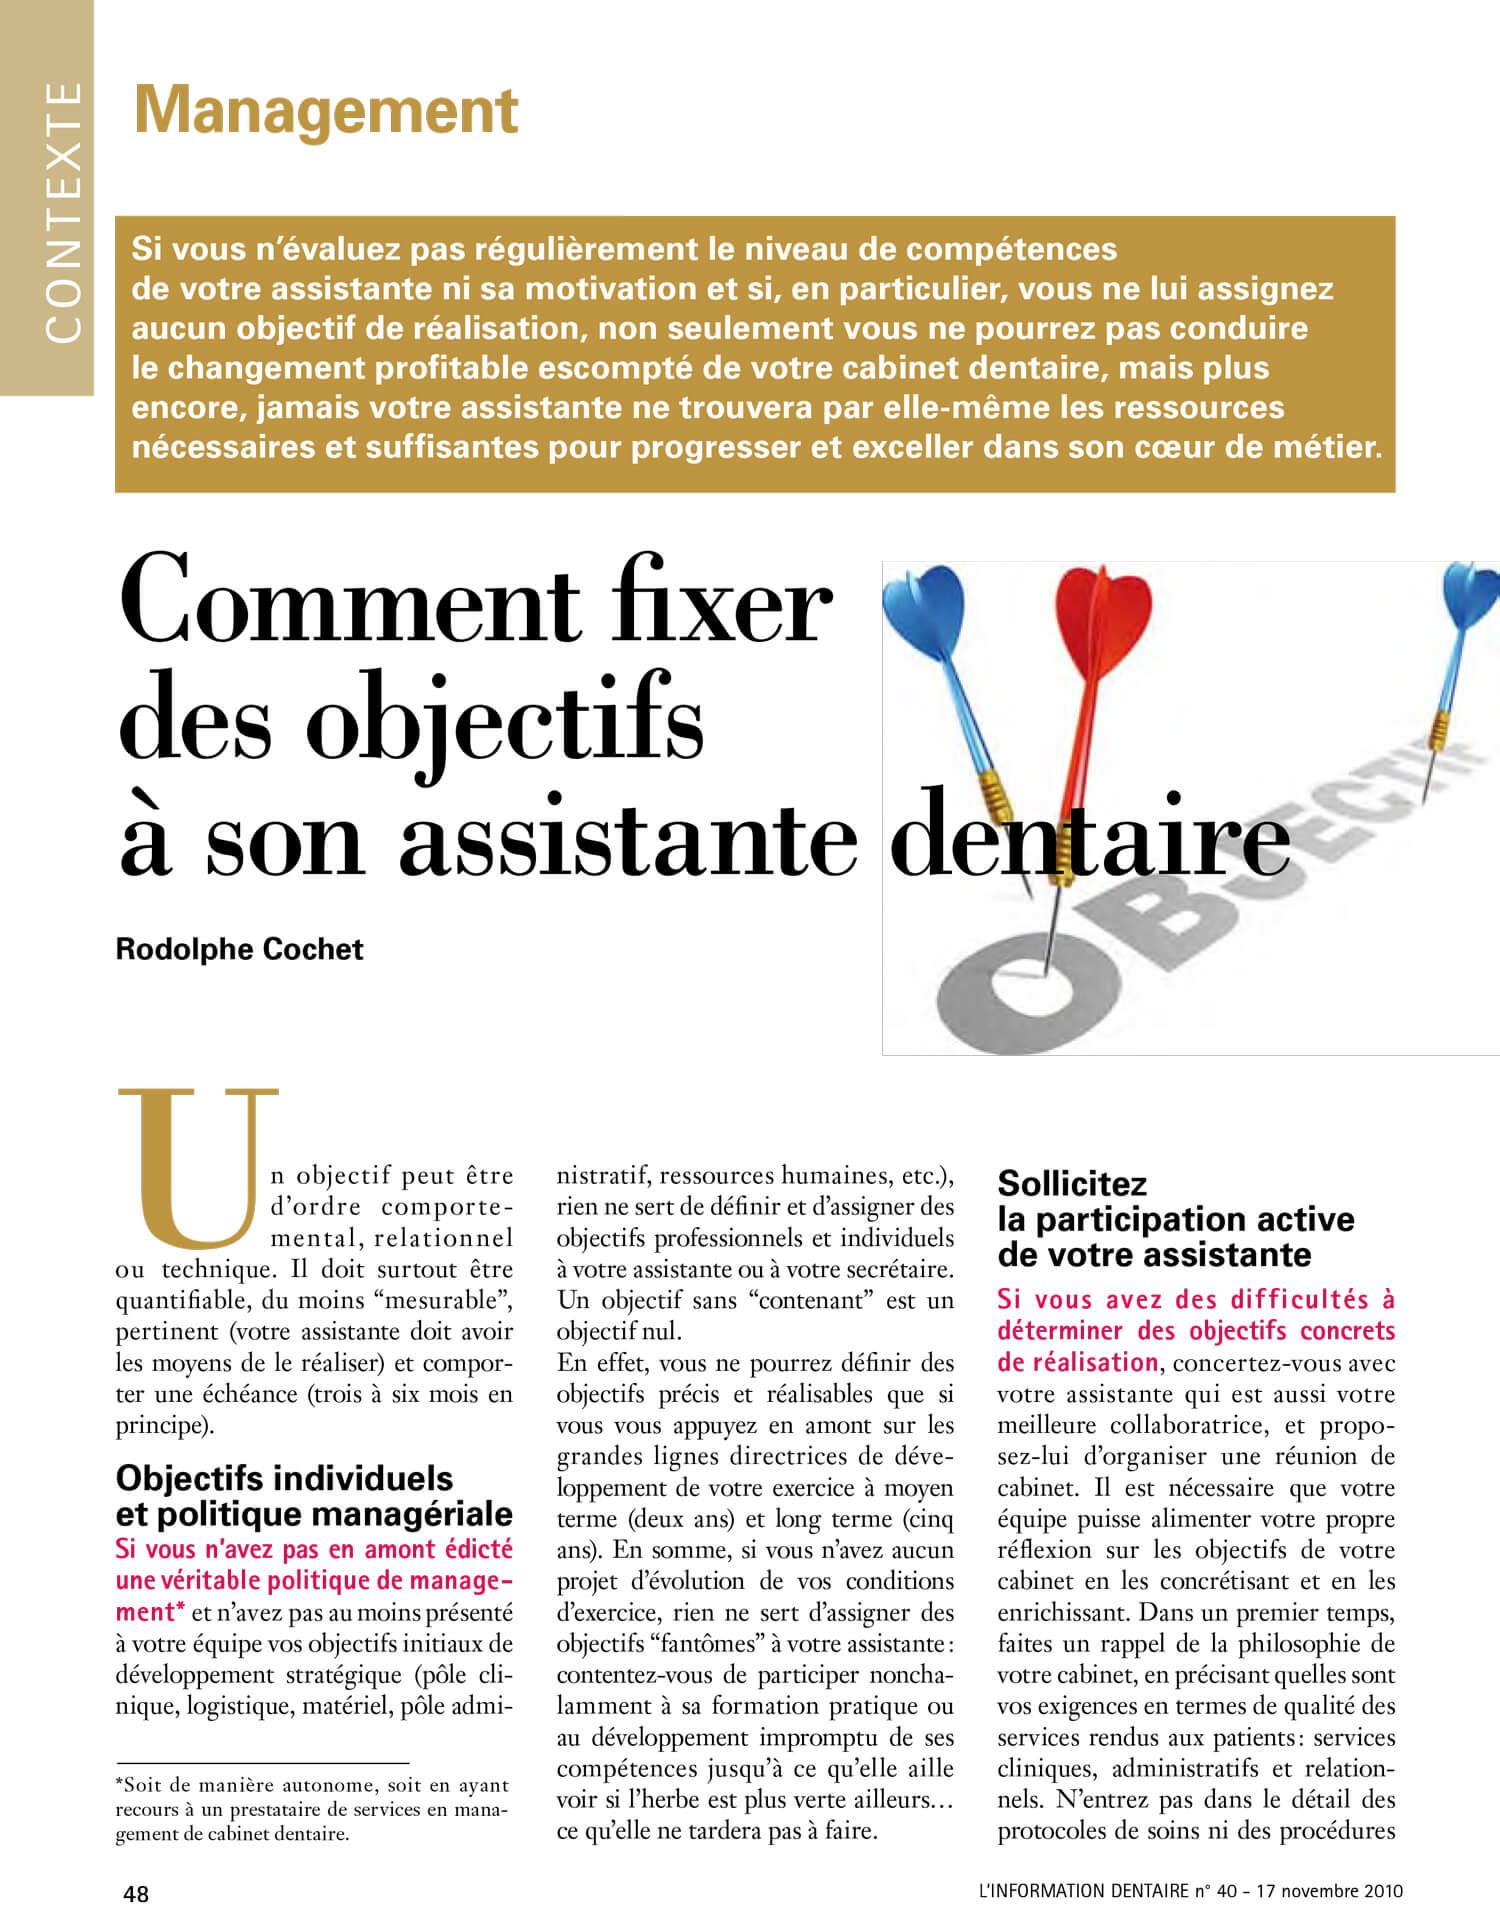 objectifs-smart-assistante-dentaire-cabinet-dentaire-developpement-management-Rodolphe-Cochet.jpg